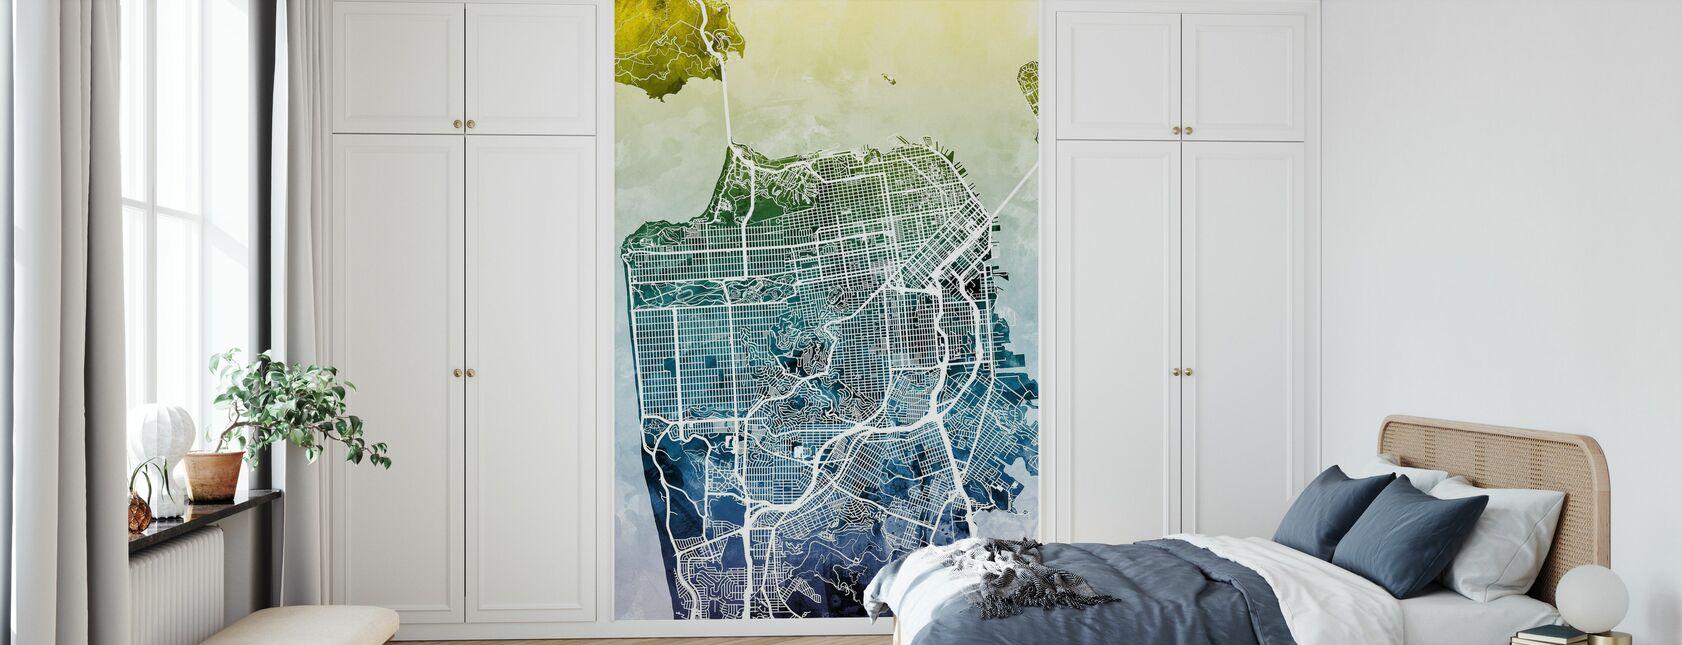 San Fransisco Street Map Bluegreen - Wallpaper - Bedroom